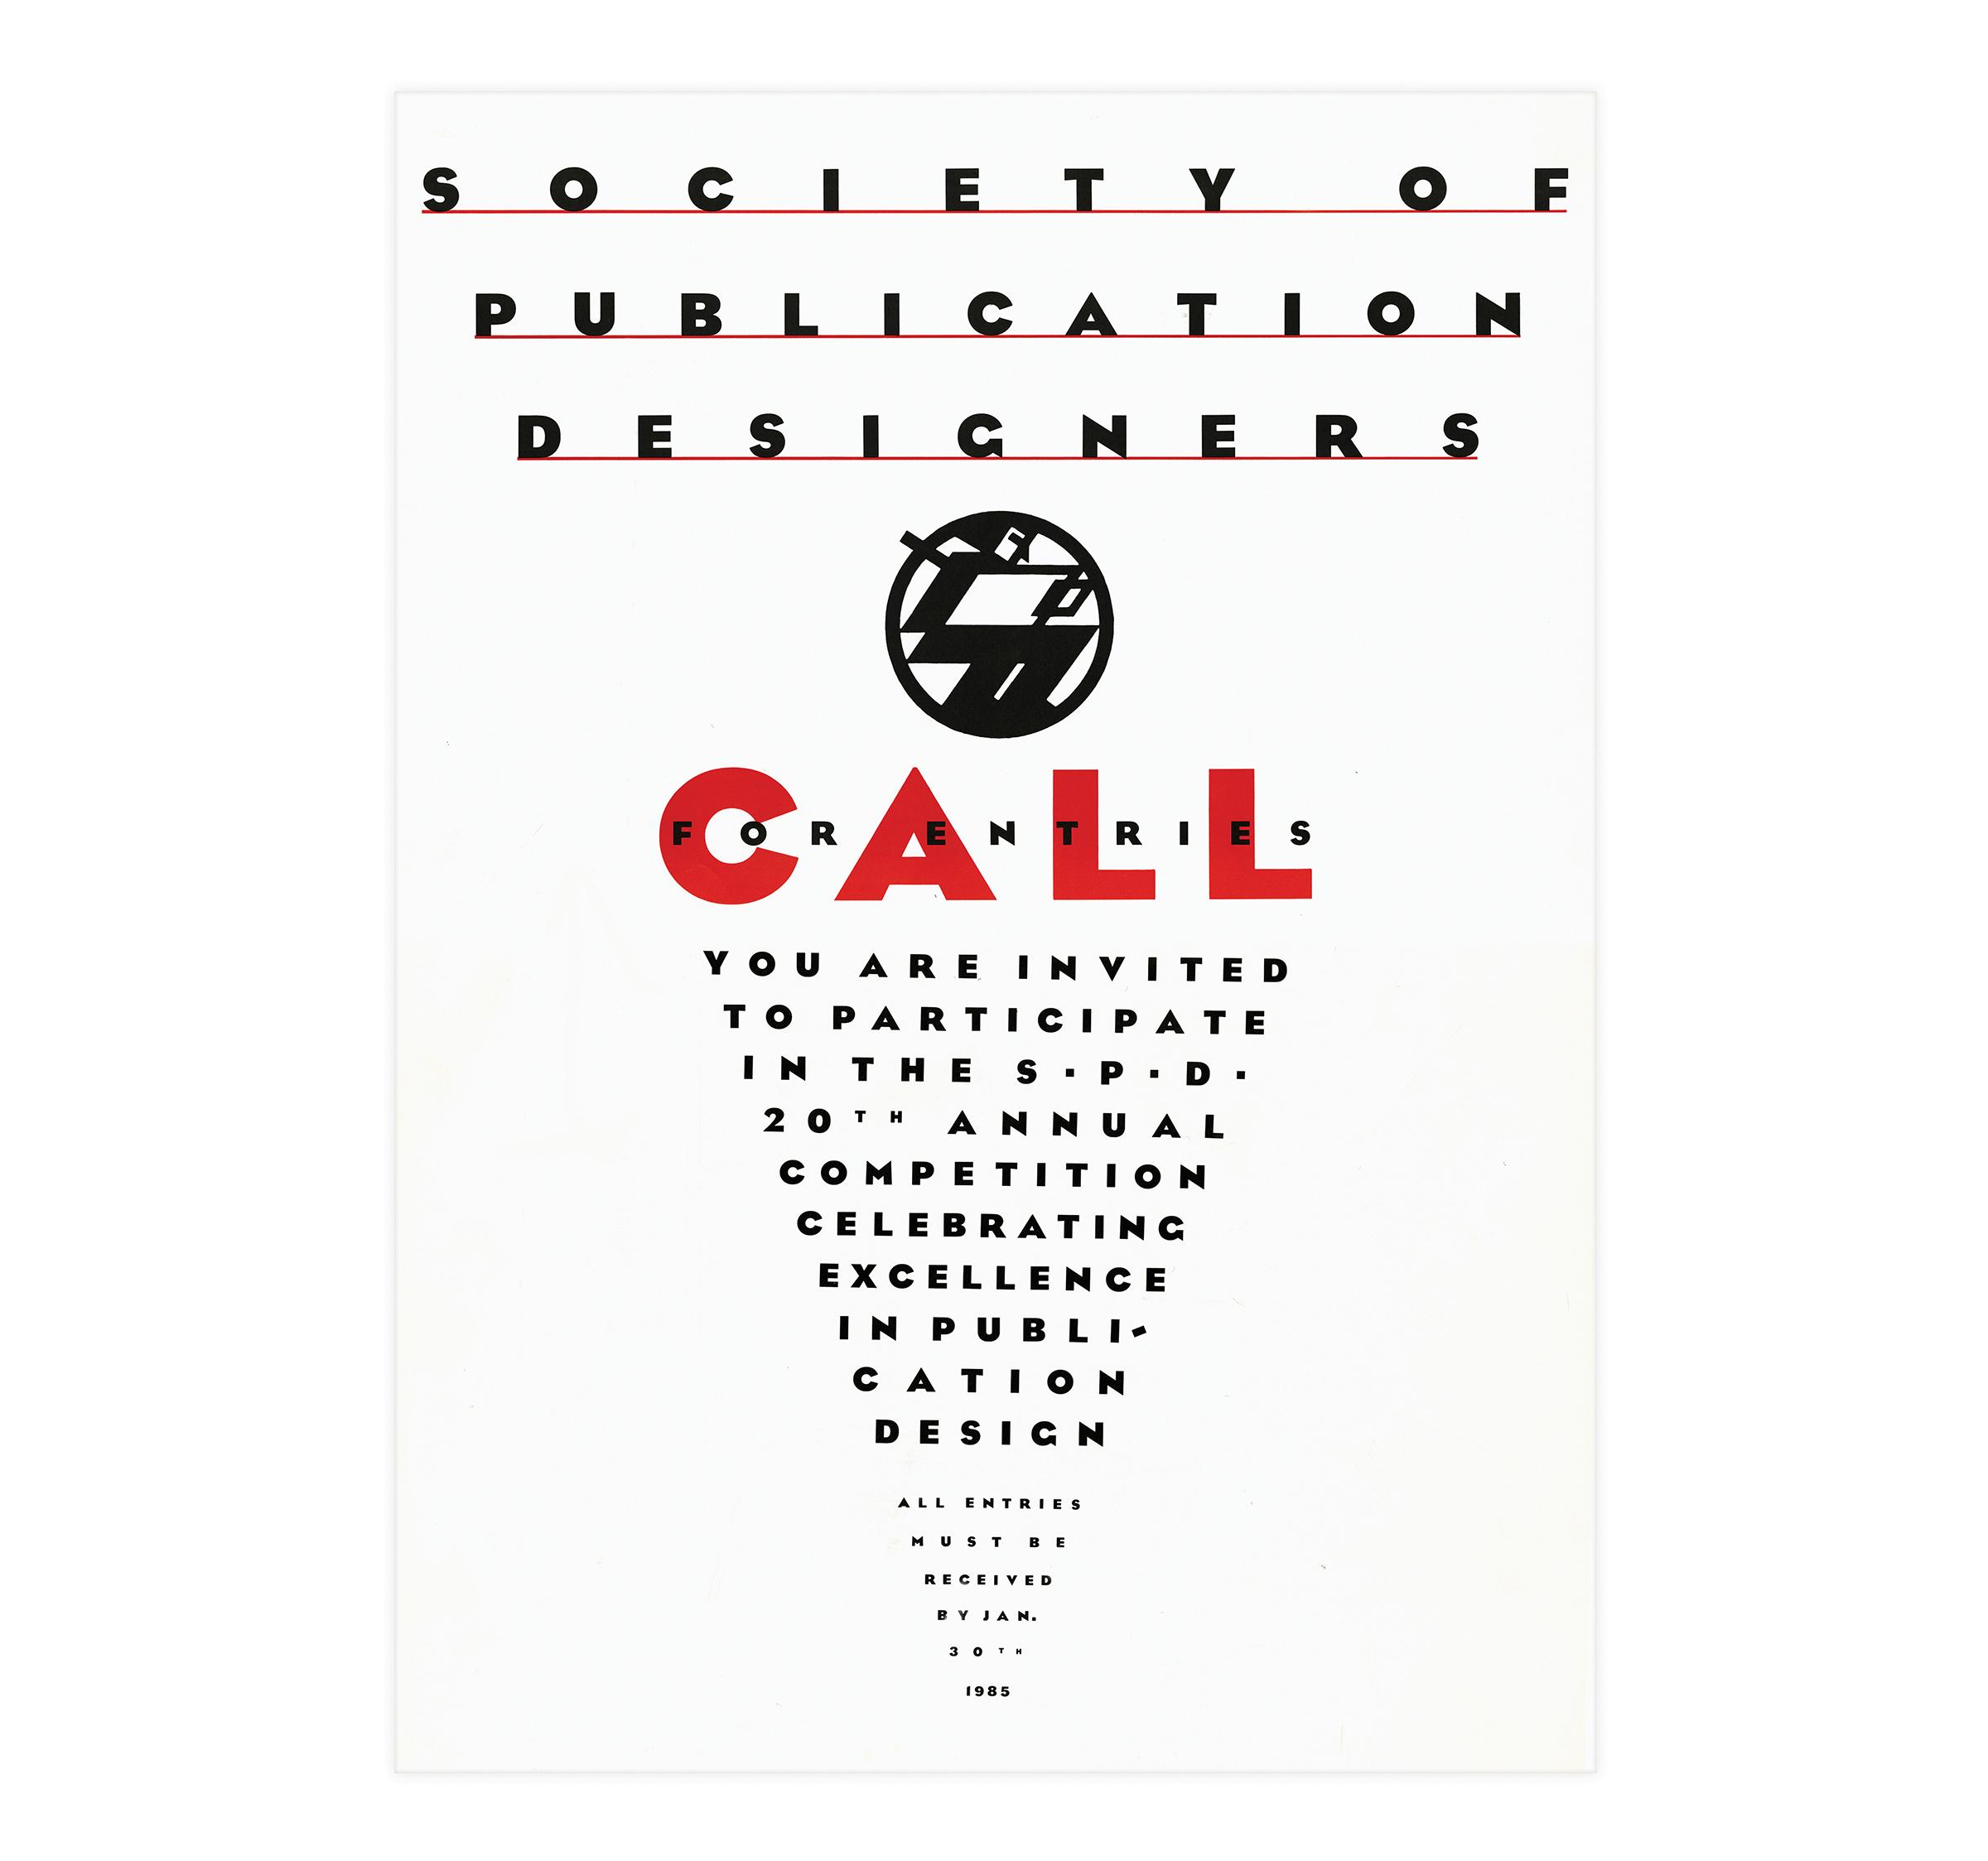 SocietyofPubDesigners_Slide.jpg